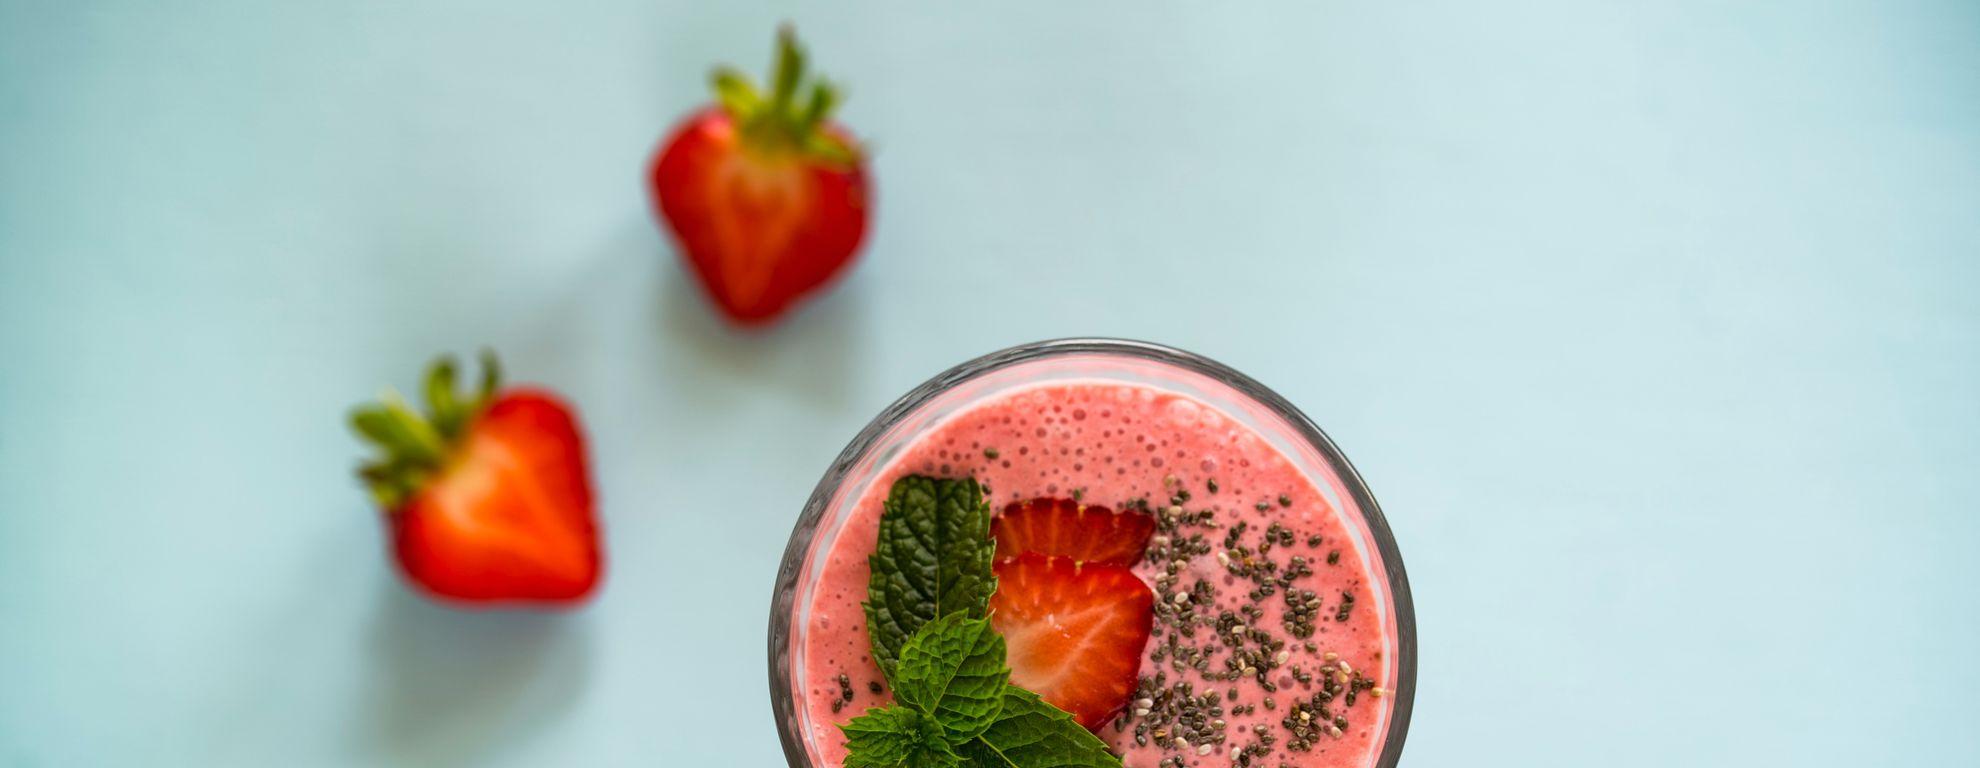 12 excelentes jugos para combatir la anemia - Featured image